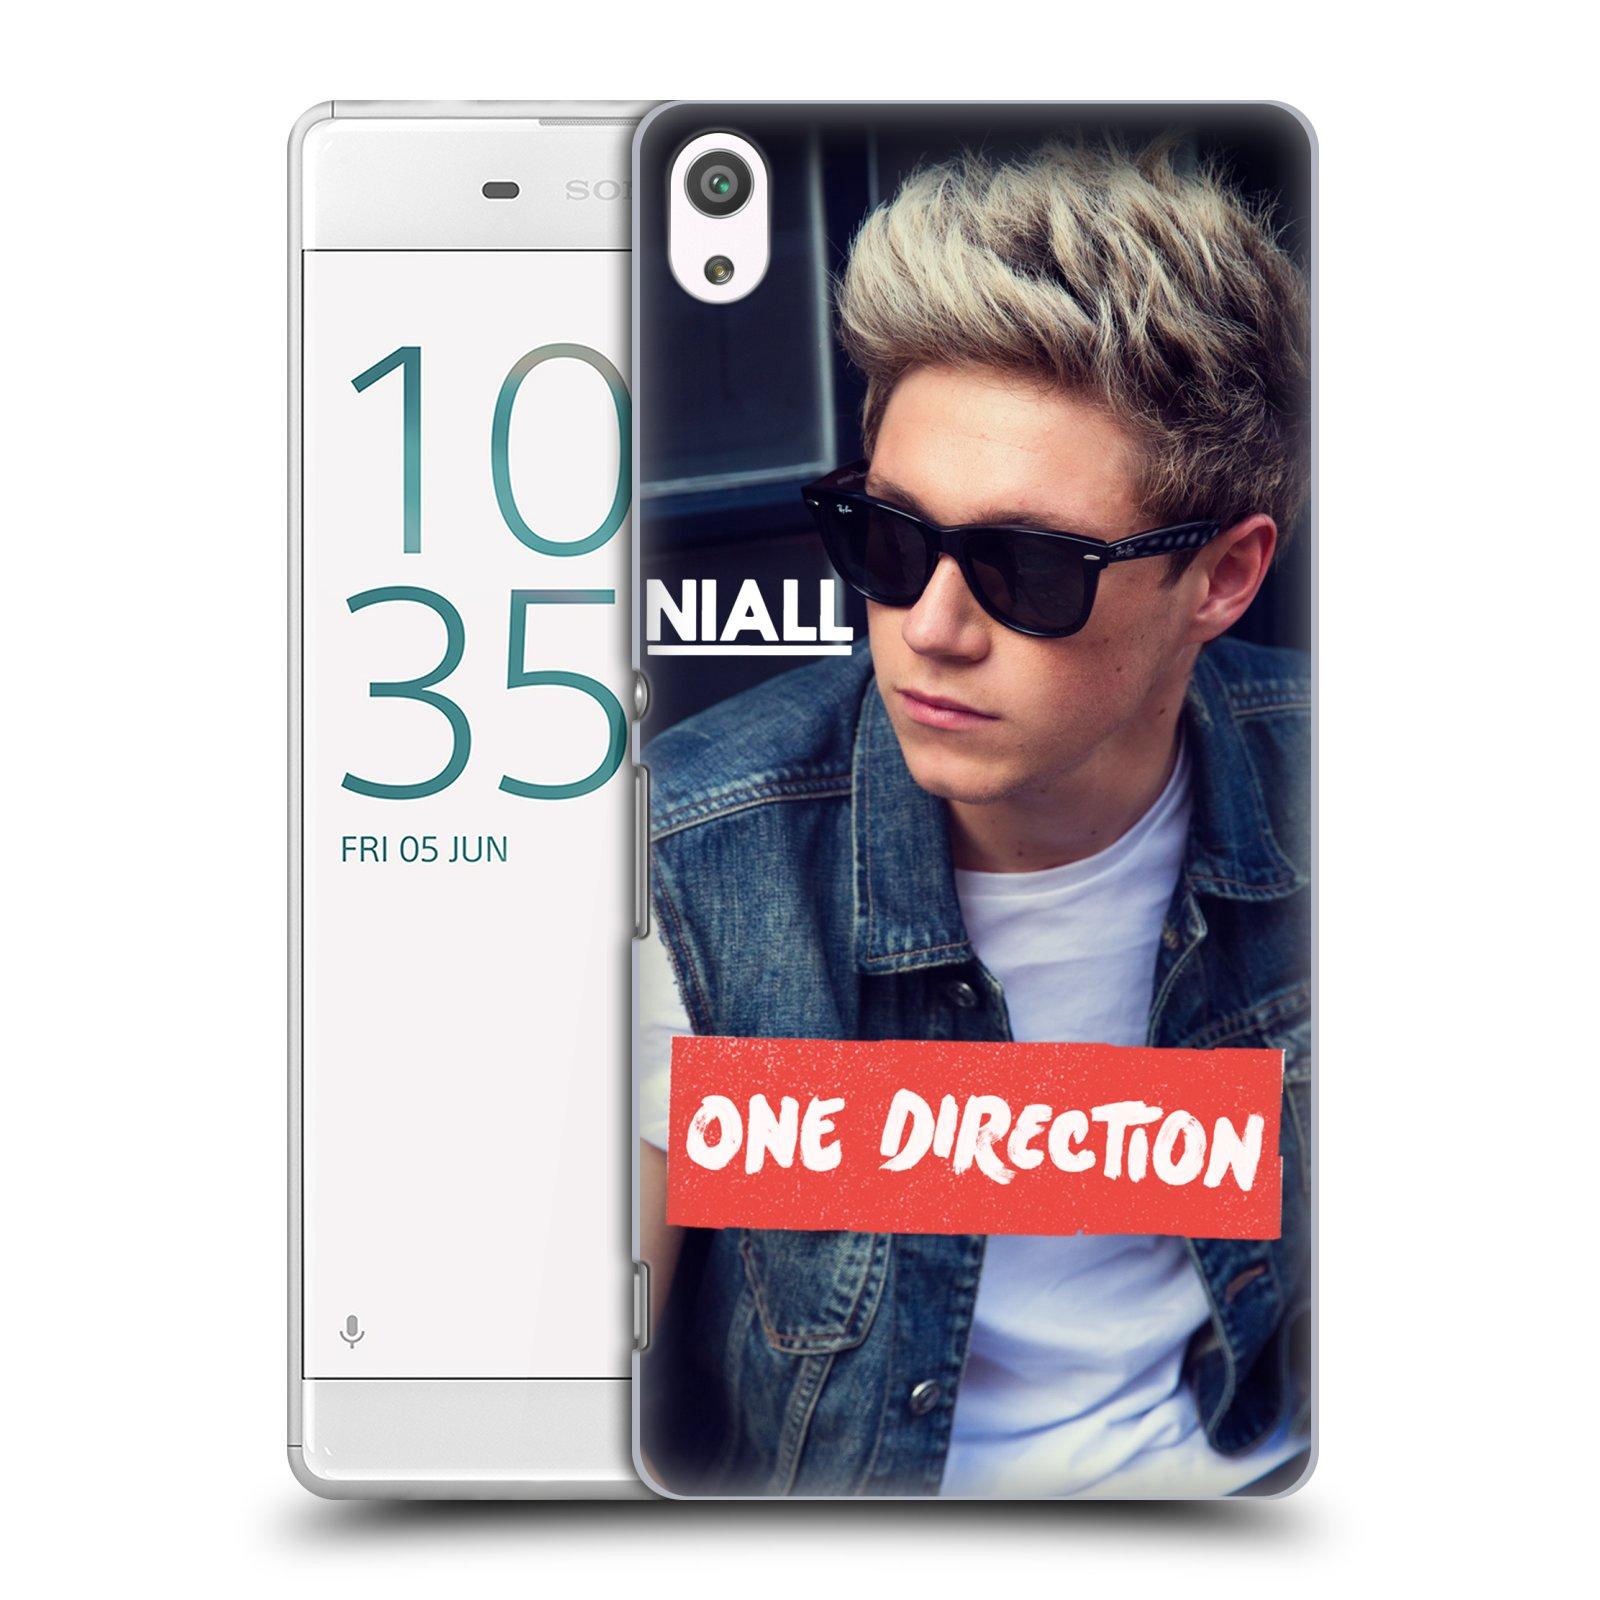 Plastové pouzdro na mobil Sony Xperia XA Ultra HEAD CASE One Direction - Niall